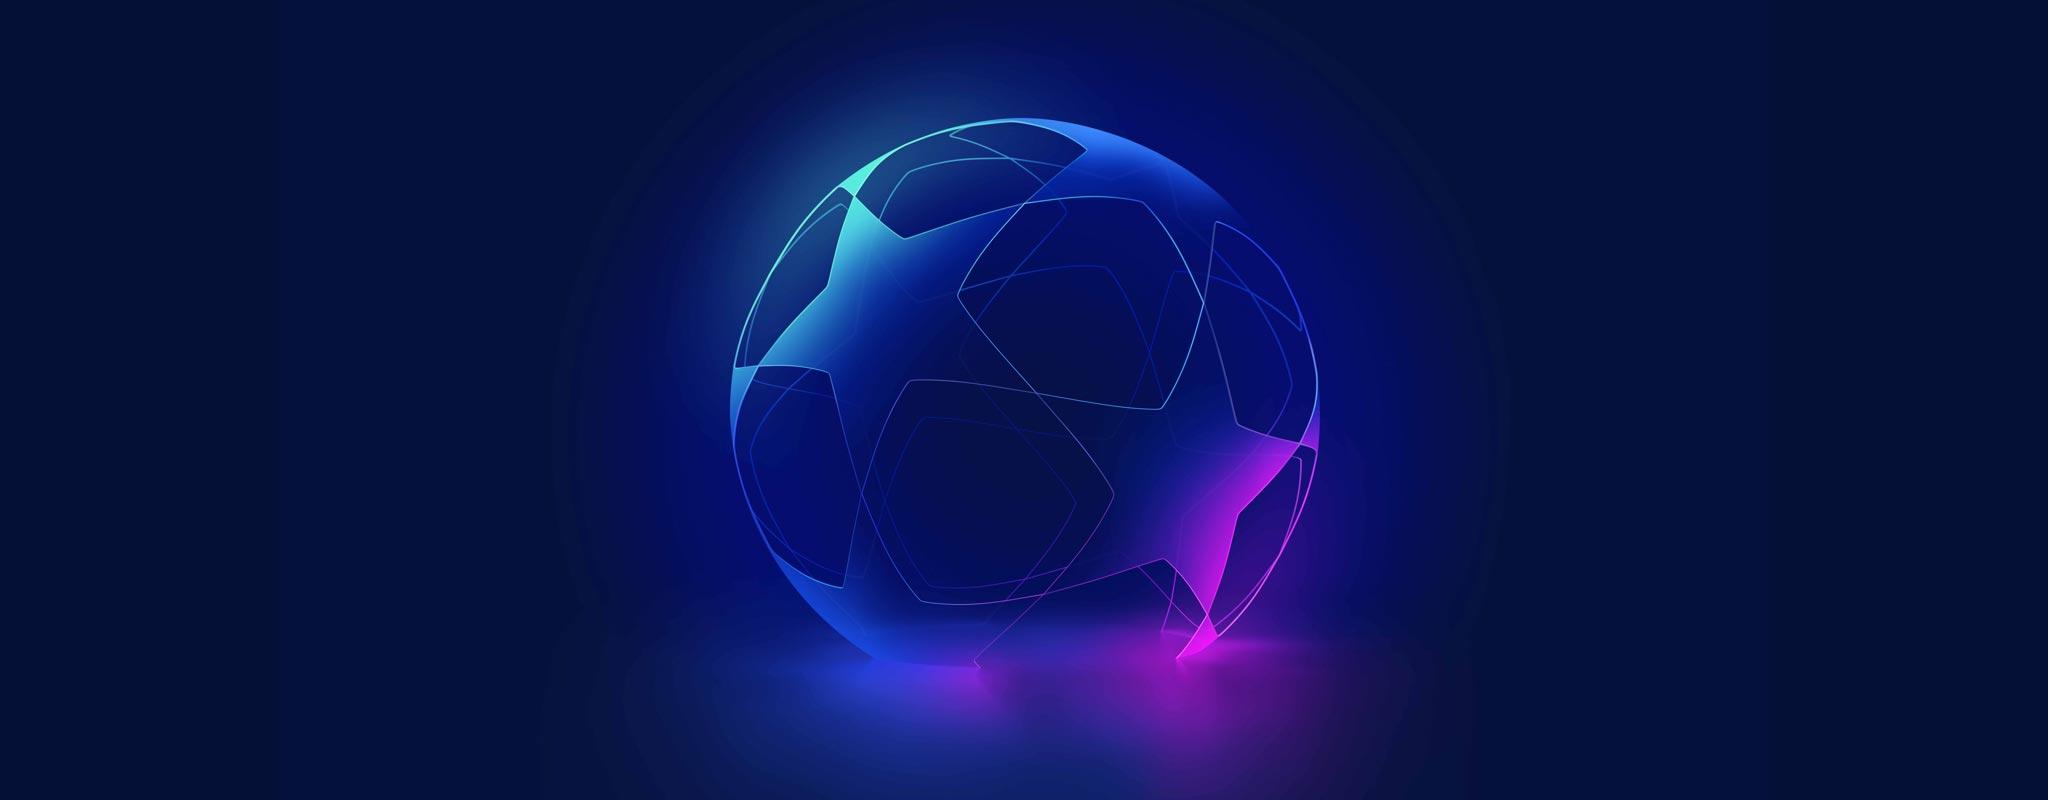 UEFA Champions League   Real Madrid Liverpool   UEFAcom 2048x800